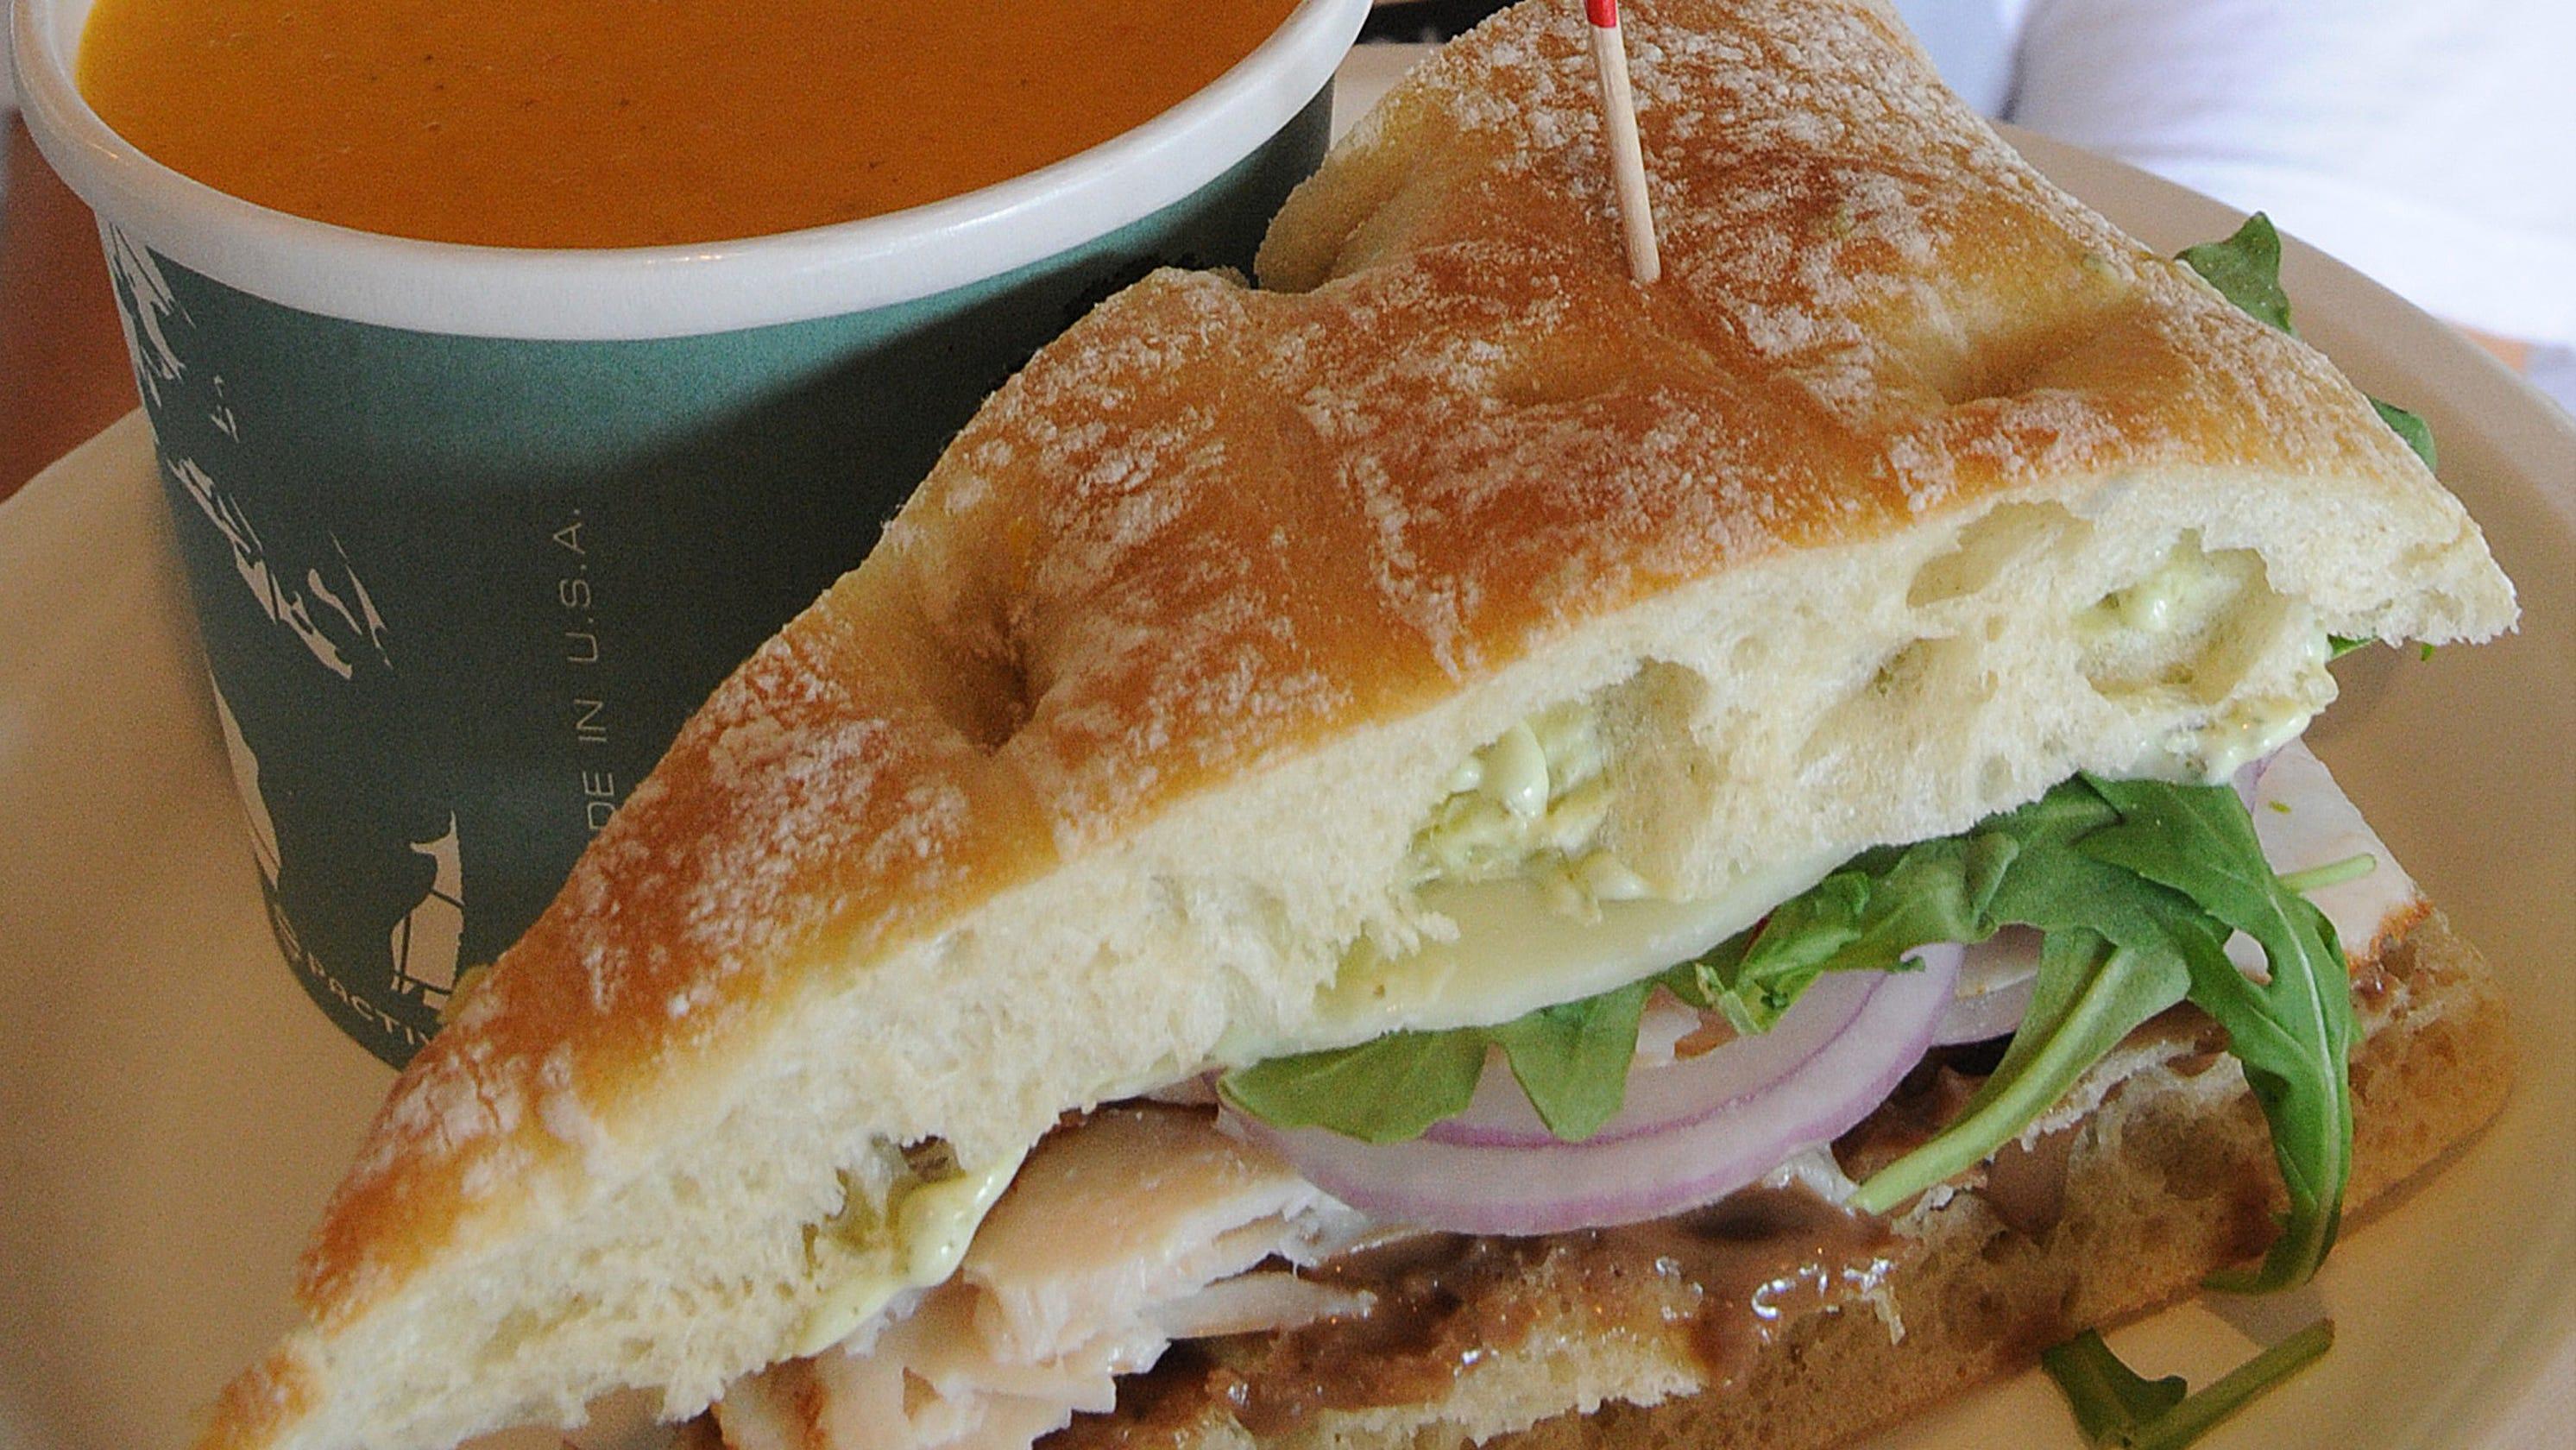 Second helpings: Recent Ventura County restaurant reviews